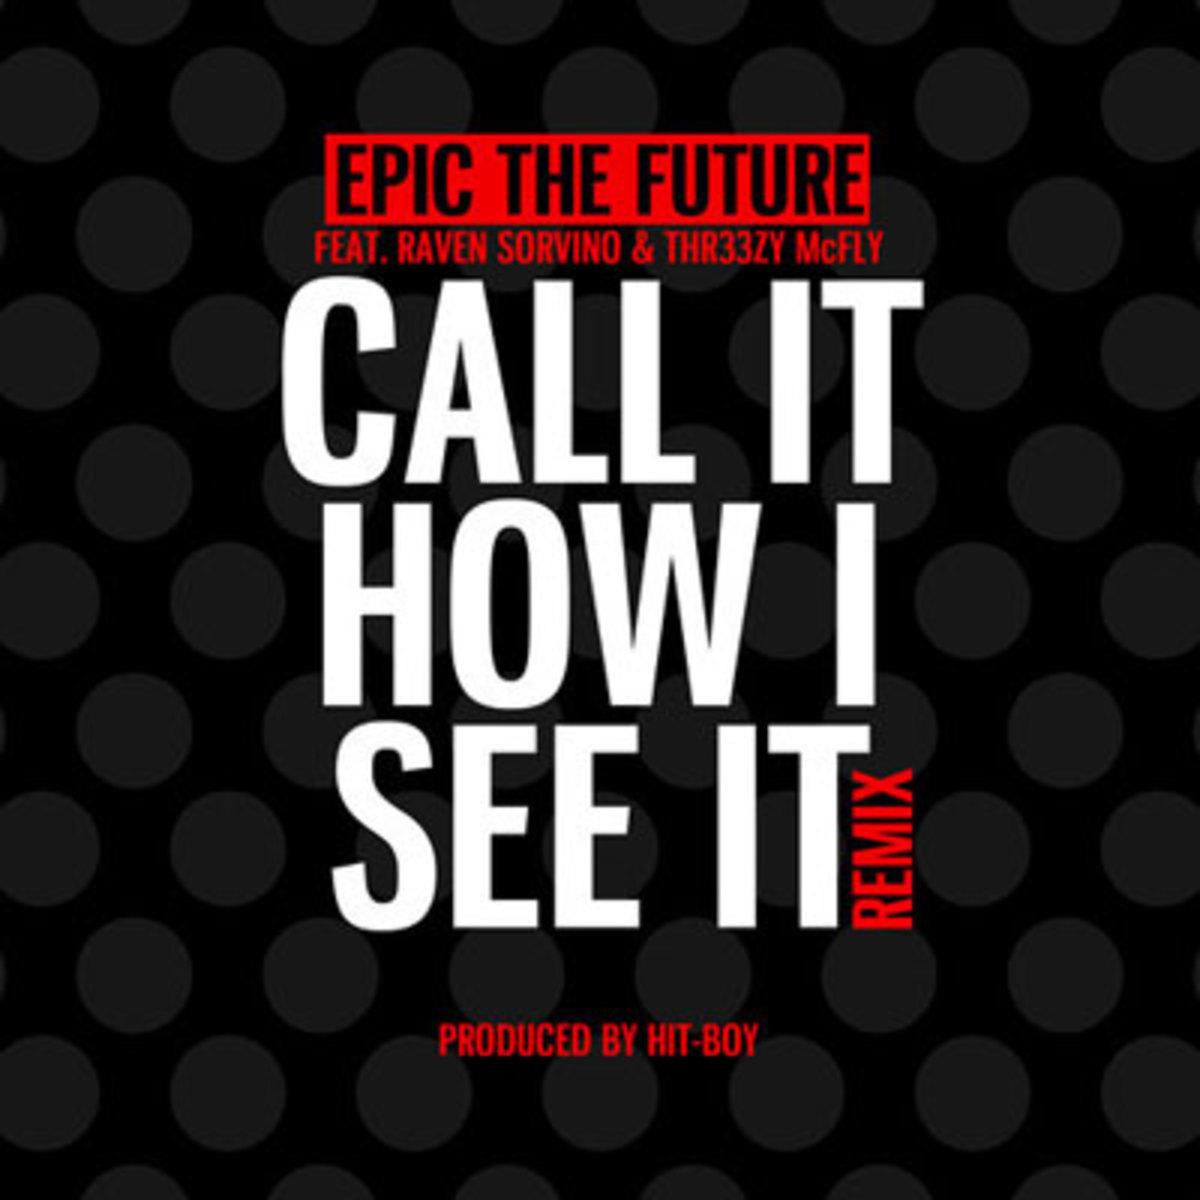 epicthefuture-callitrmx.jpg